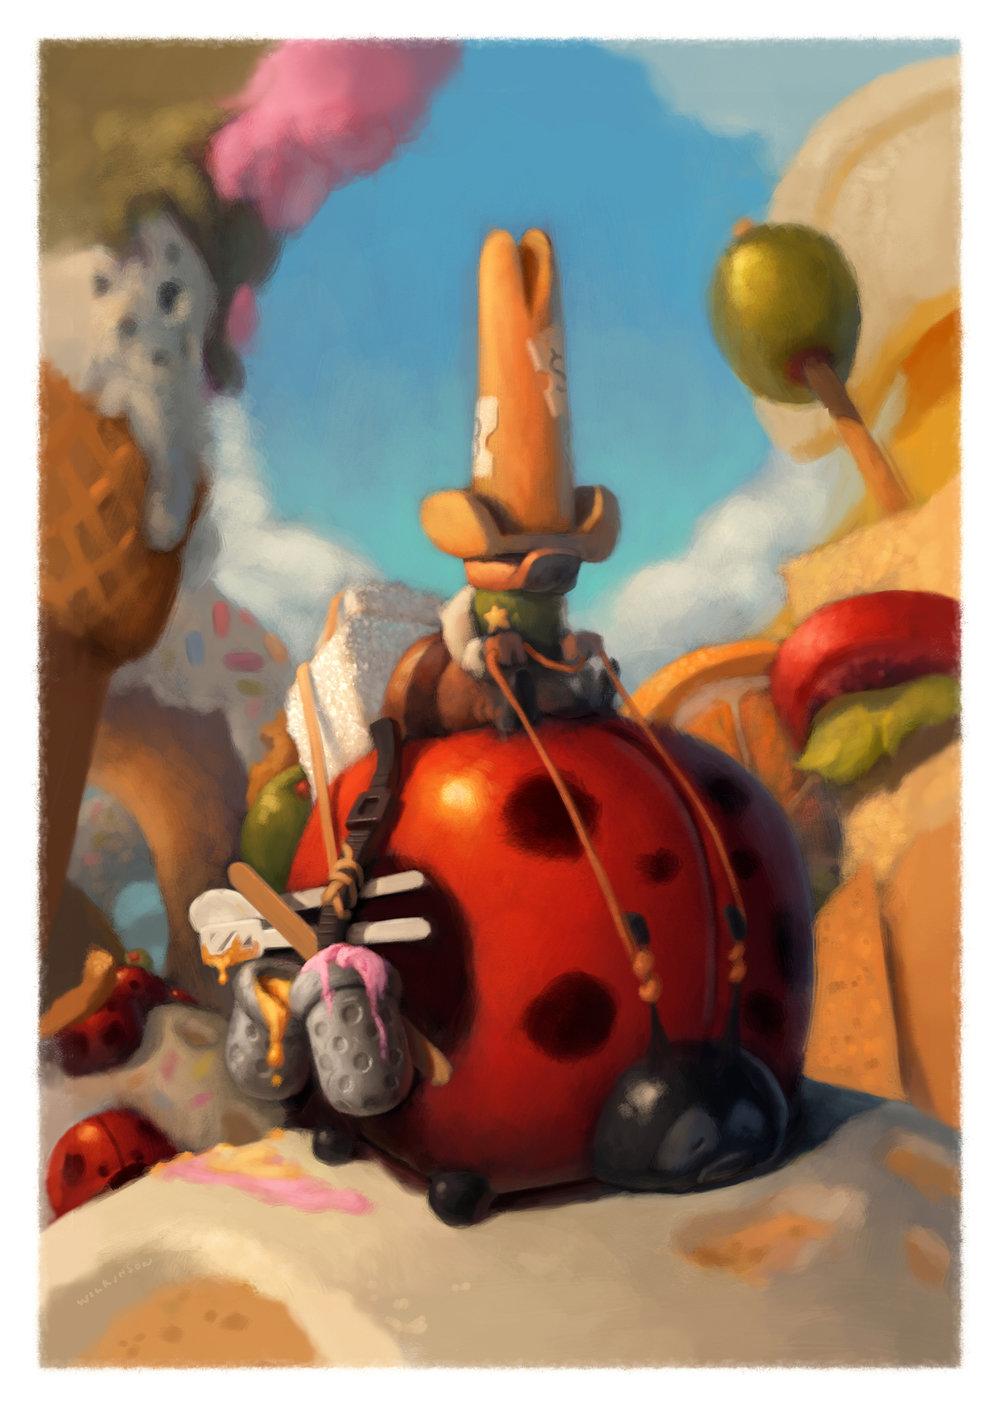 Sugar Ants, Children's Illustration